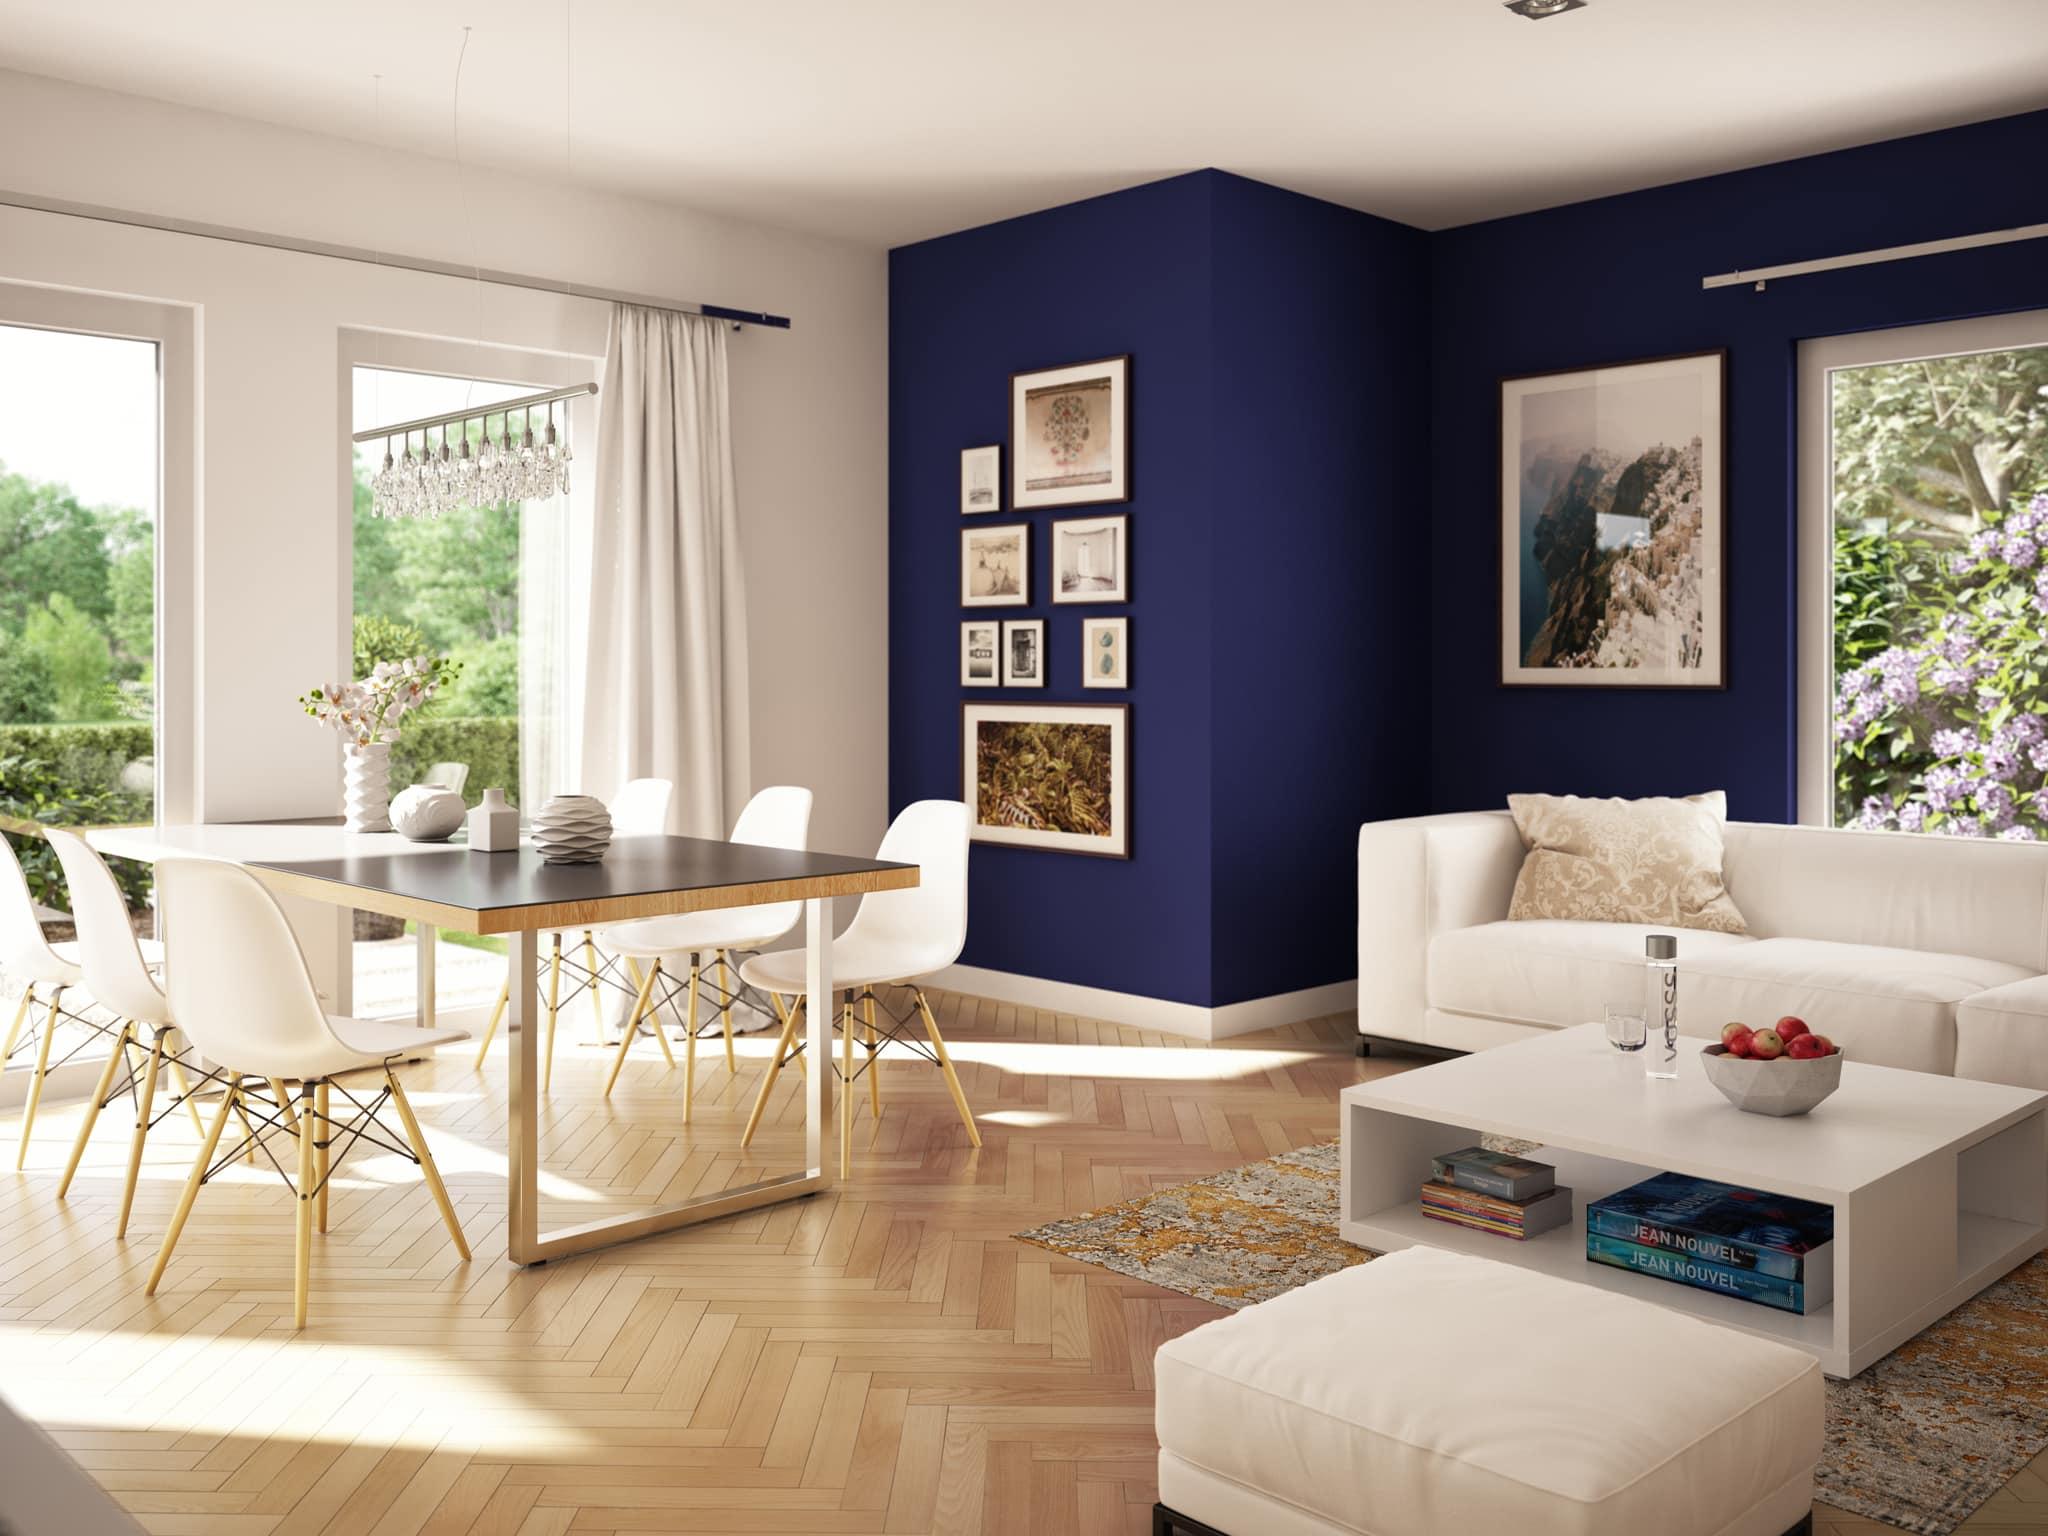 Wohnzimmer Ideen - Inneneinrichtung Stadtvilla Fertighaus Living Haus SUNSHINE 136 V7 - HausbauDirekt.de